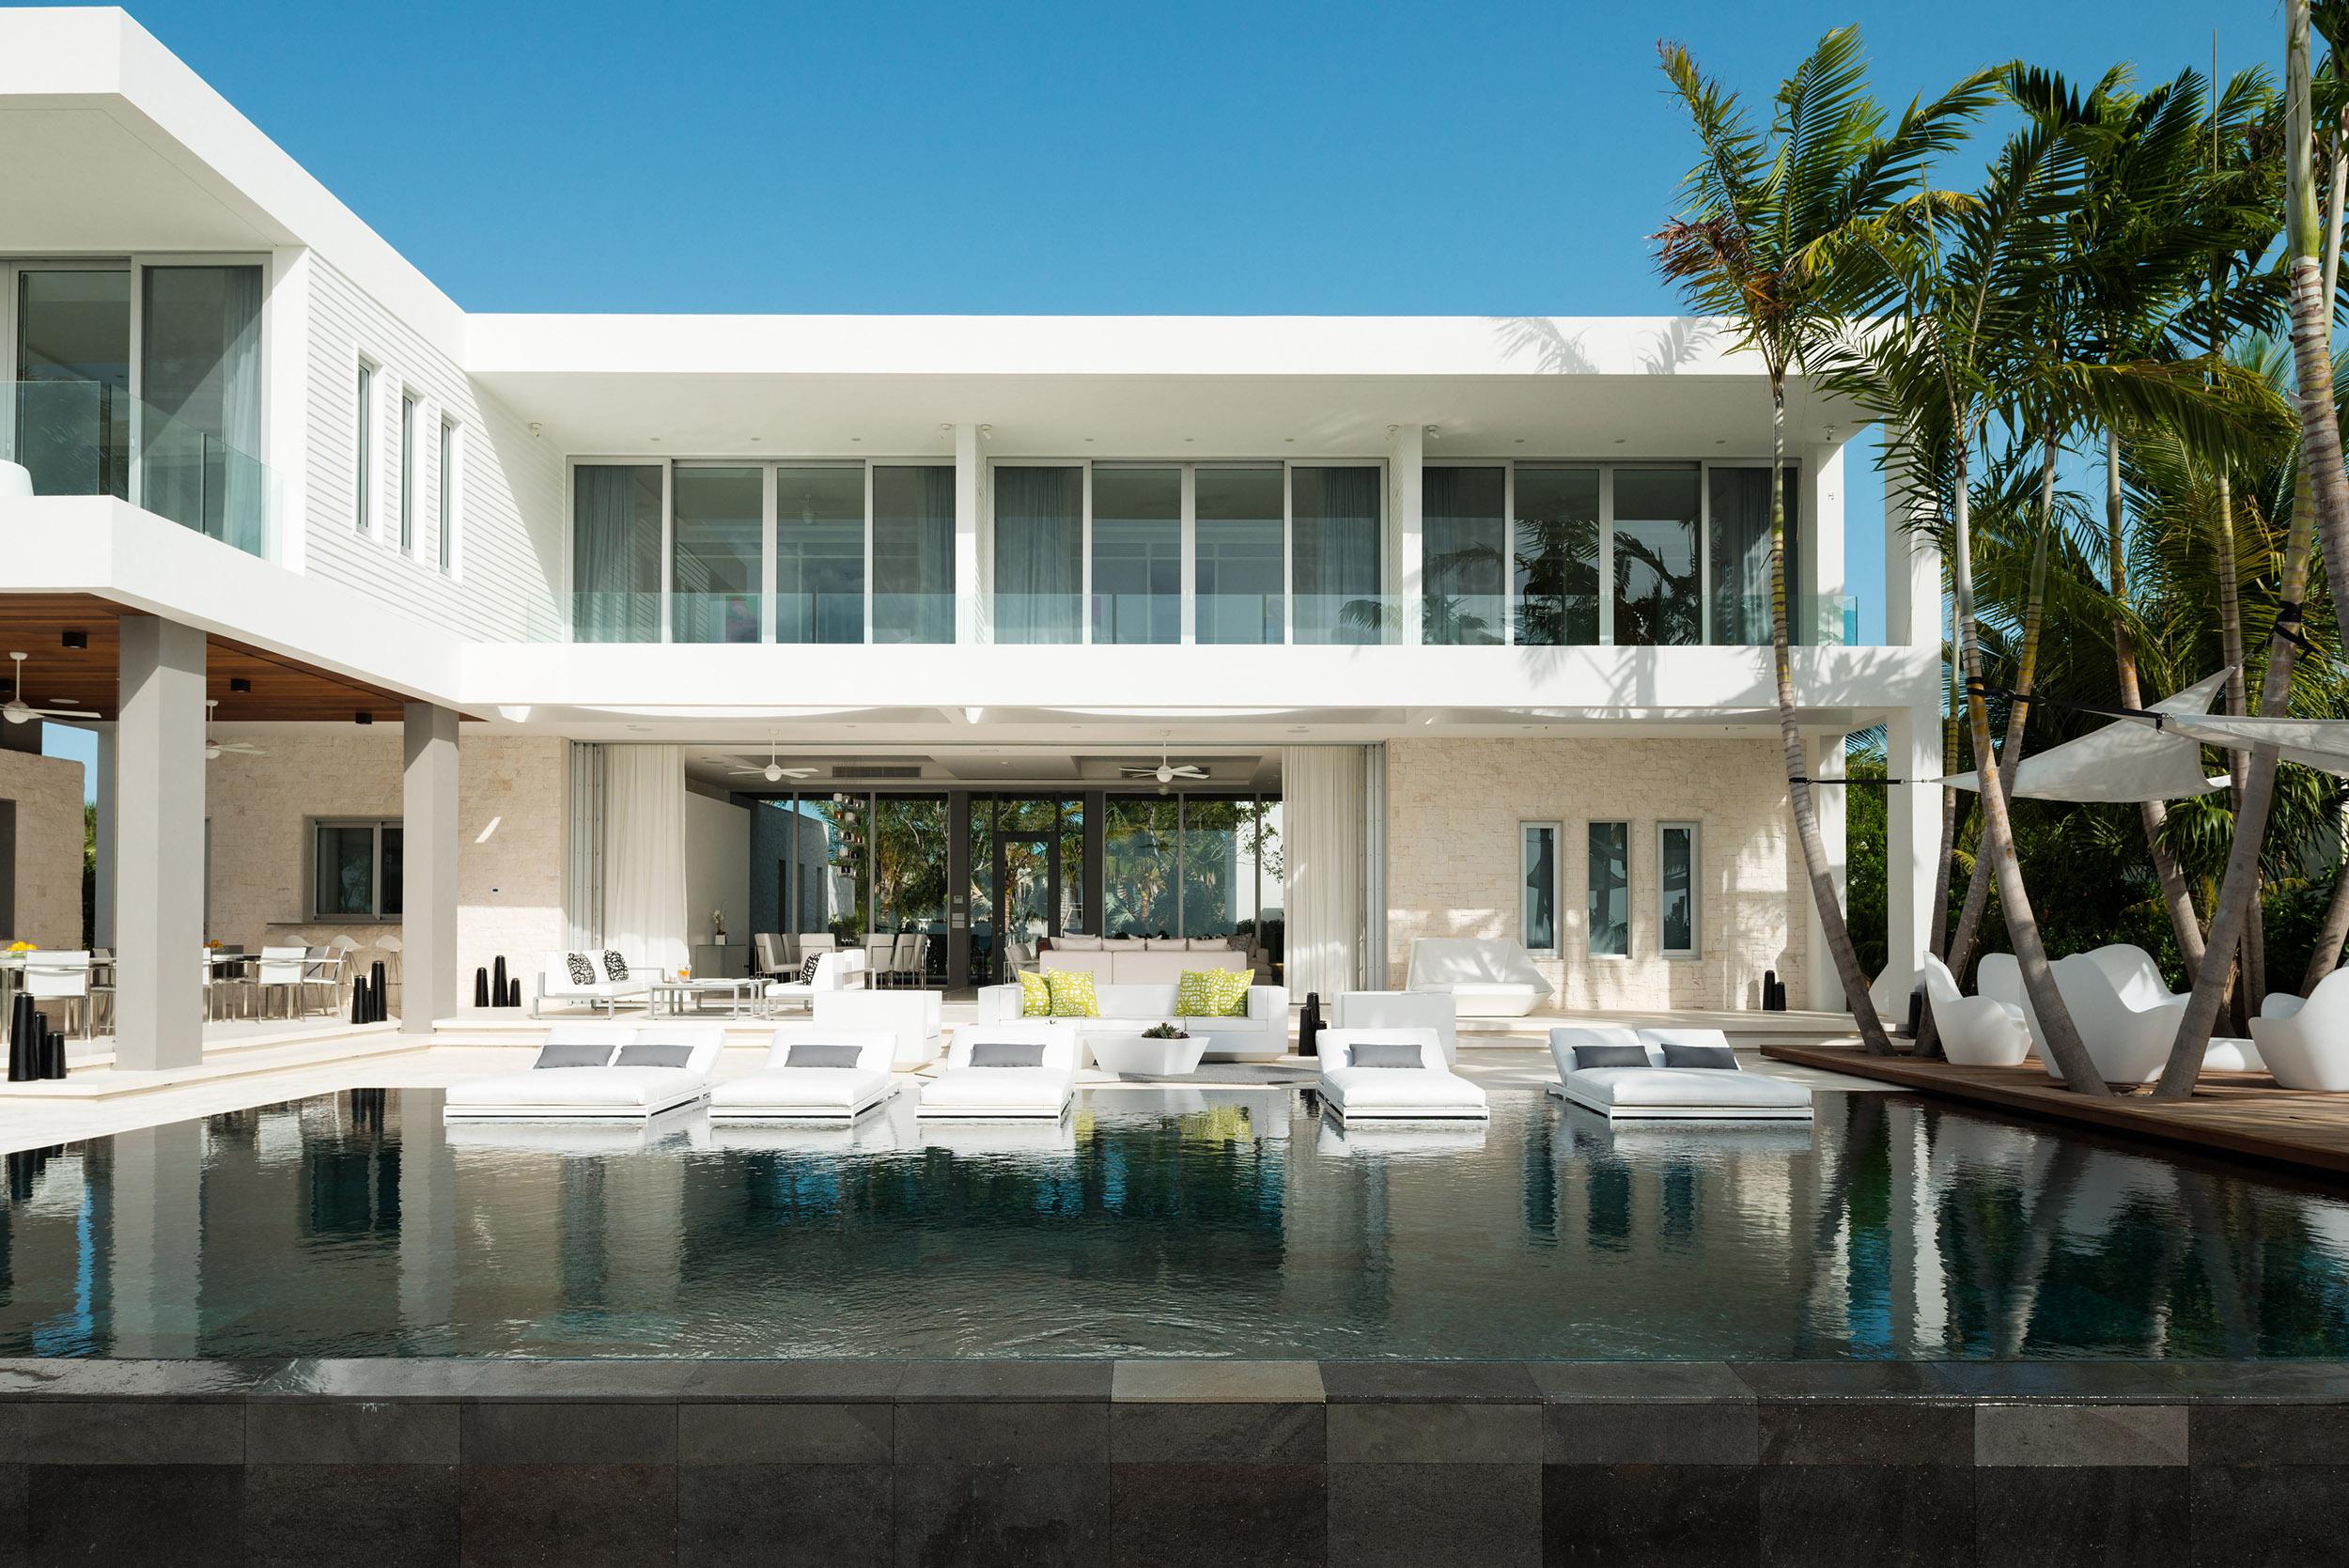 Villa Awa - view of the villa across the pool